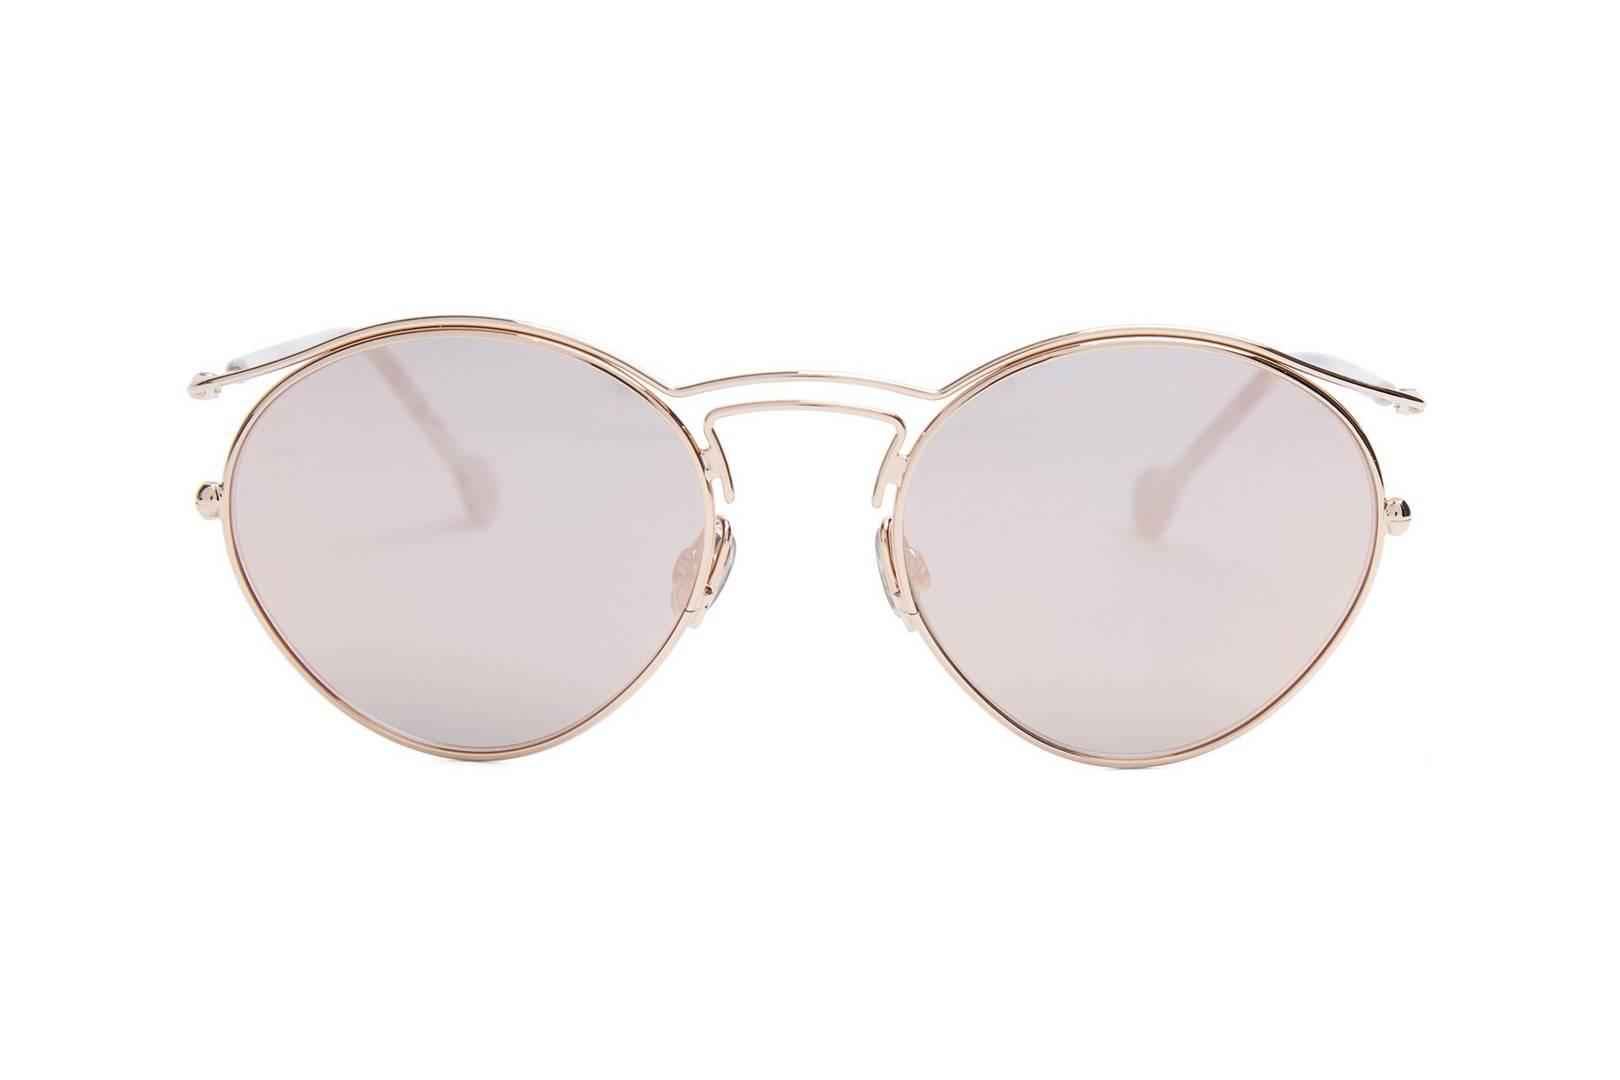 356f6804c821 Best Sunglasses 2017